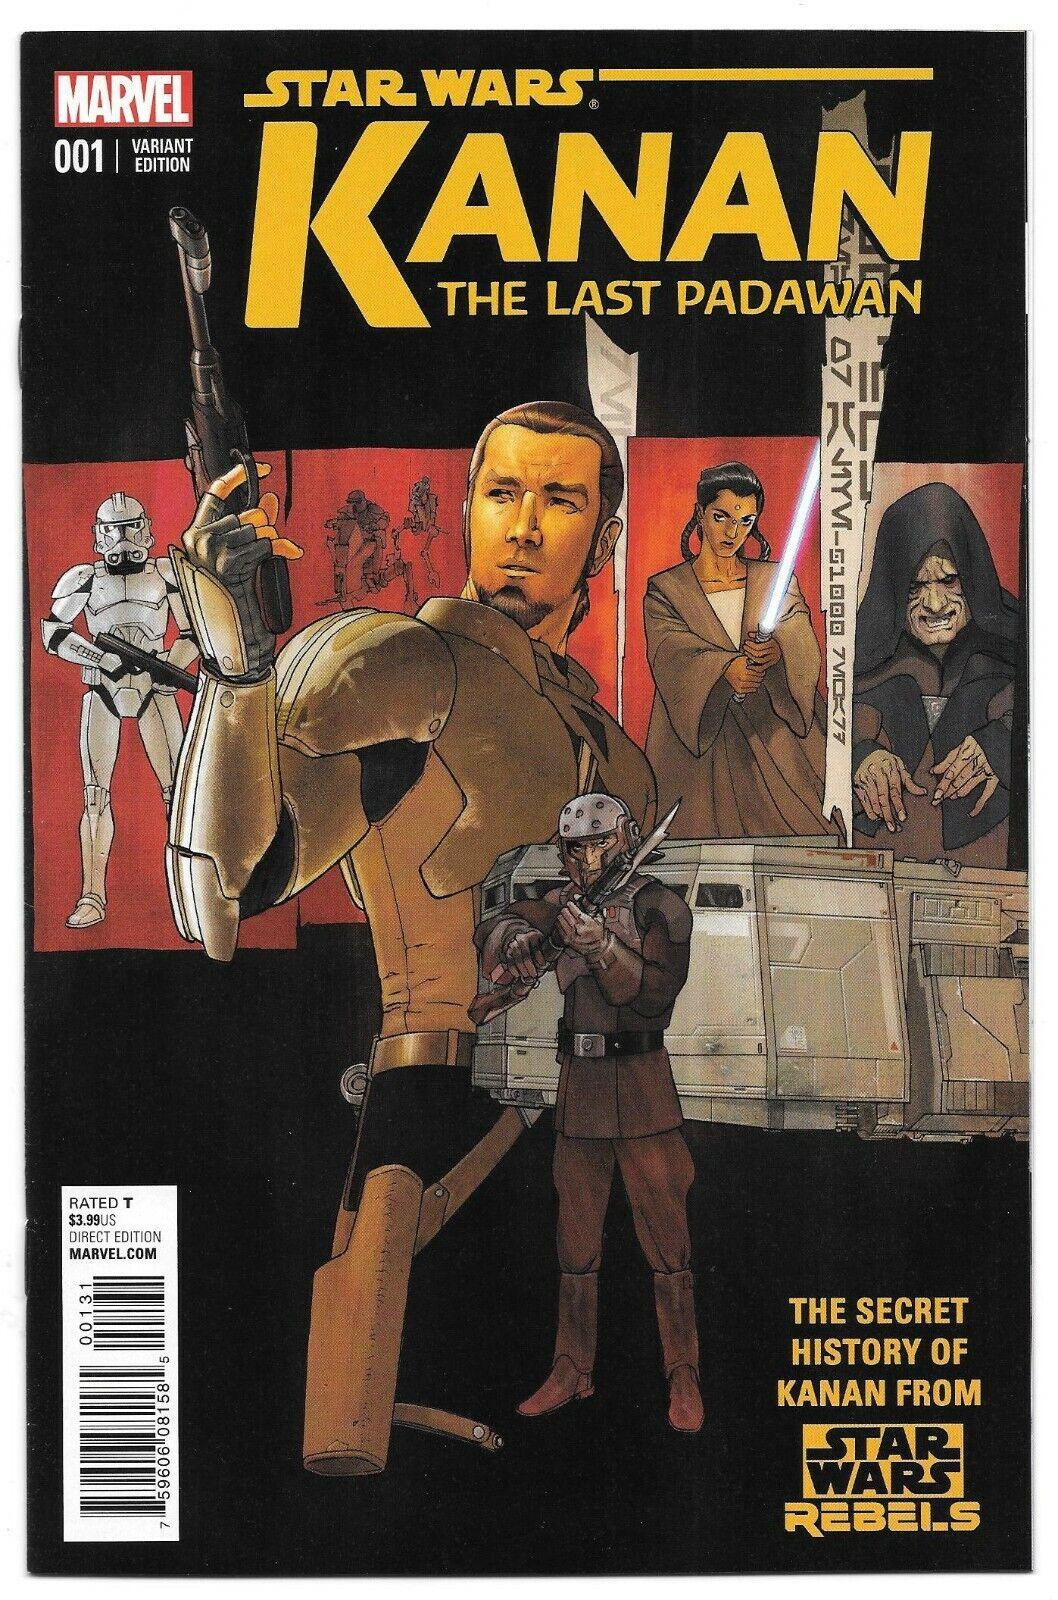 STAR WARS KANAN THE LAST PADAWAN 1 1 25 Plunkett 1st Kanan Jarrus Sabine Wren - $299.99